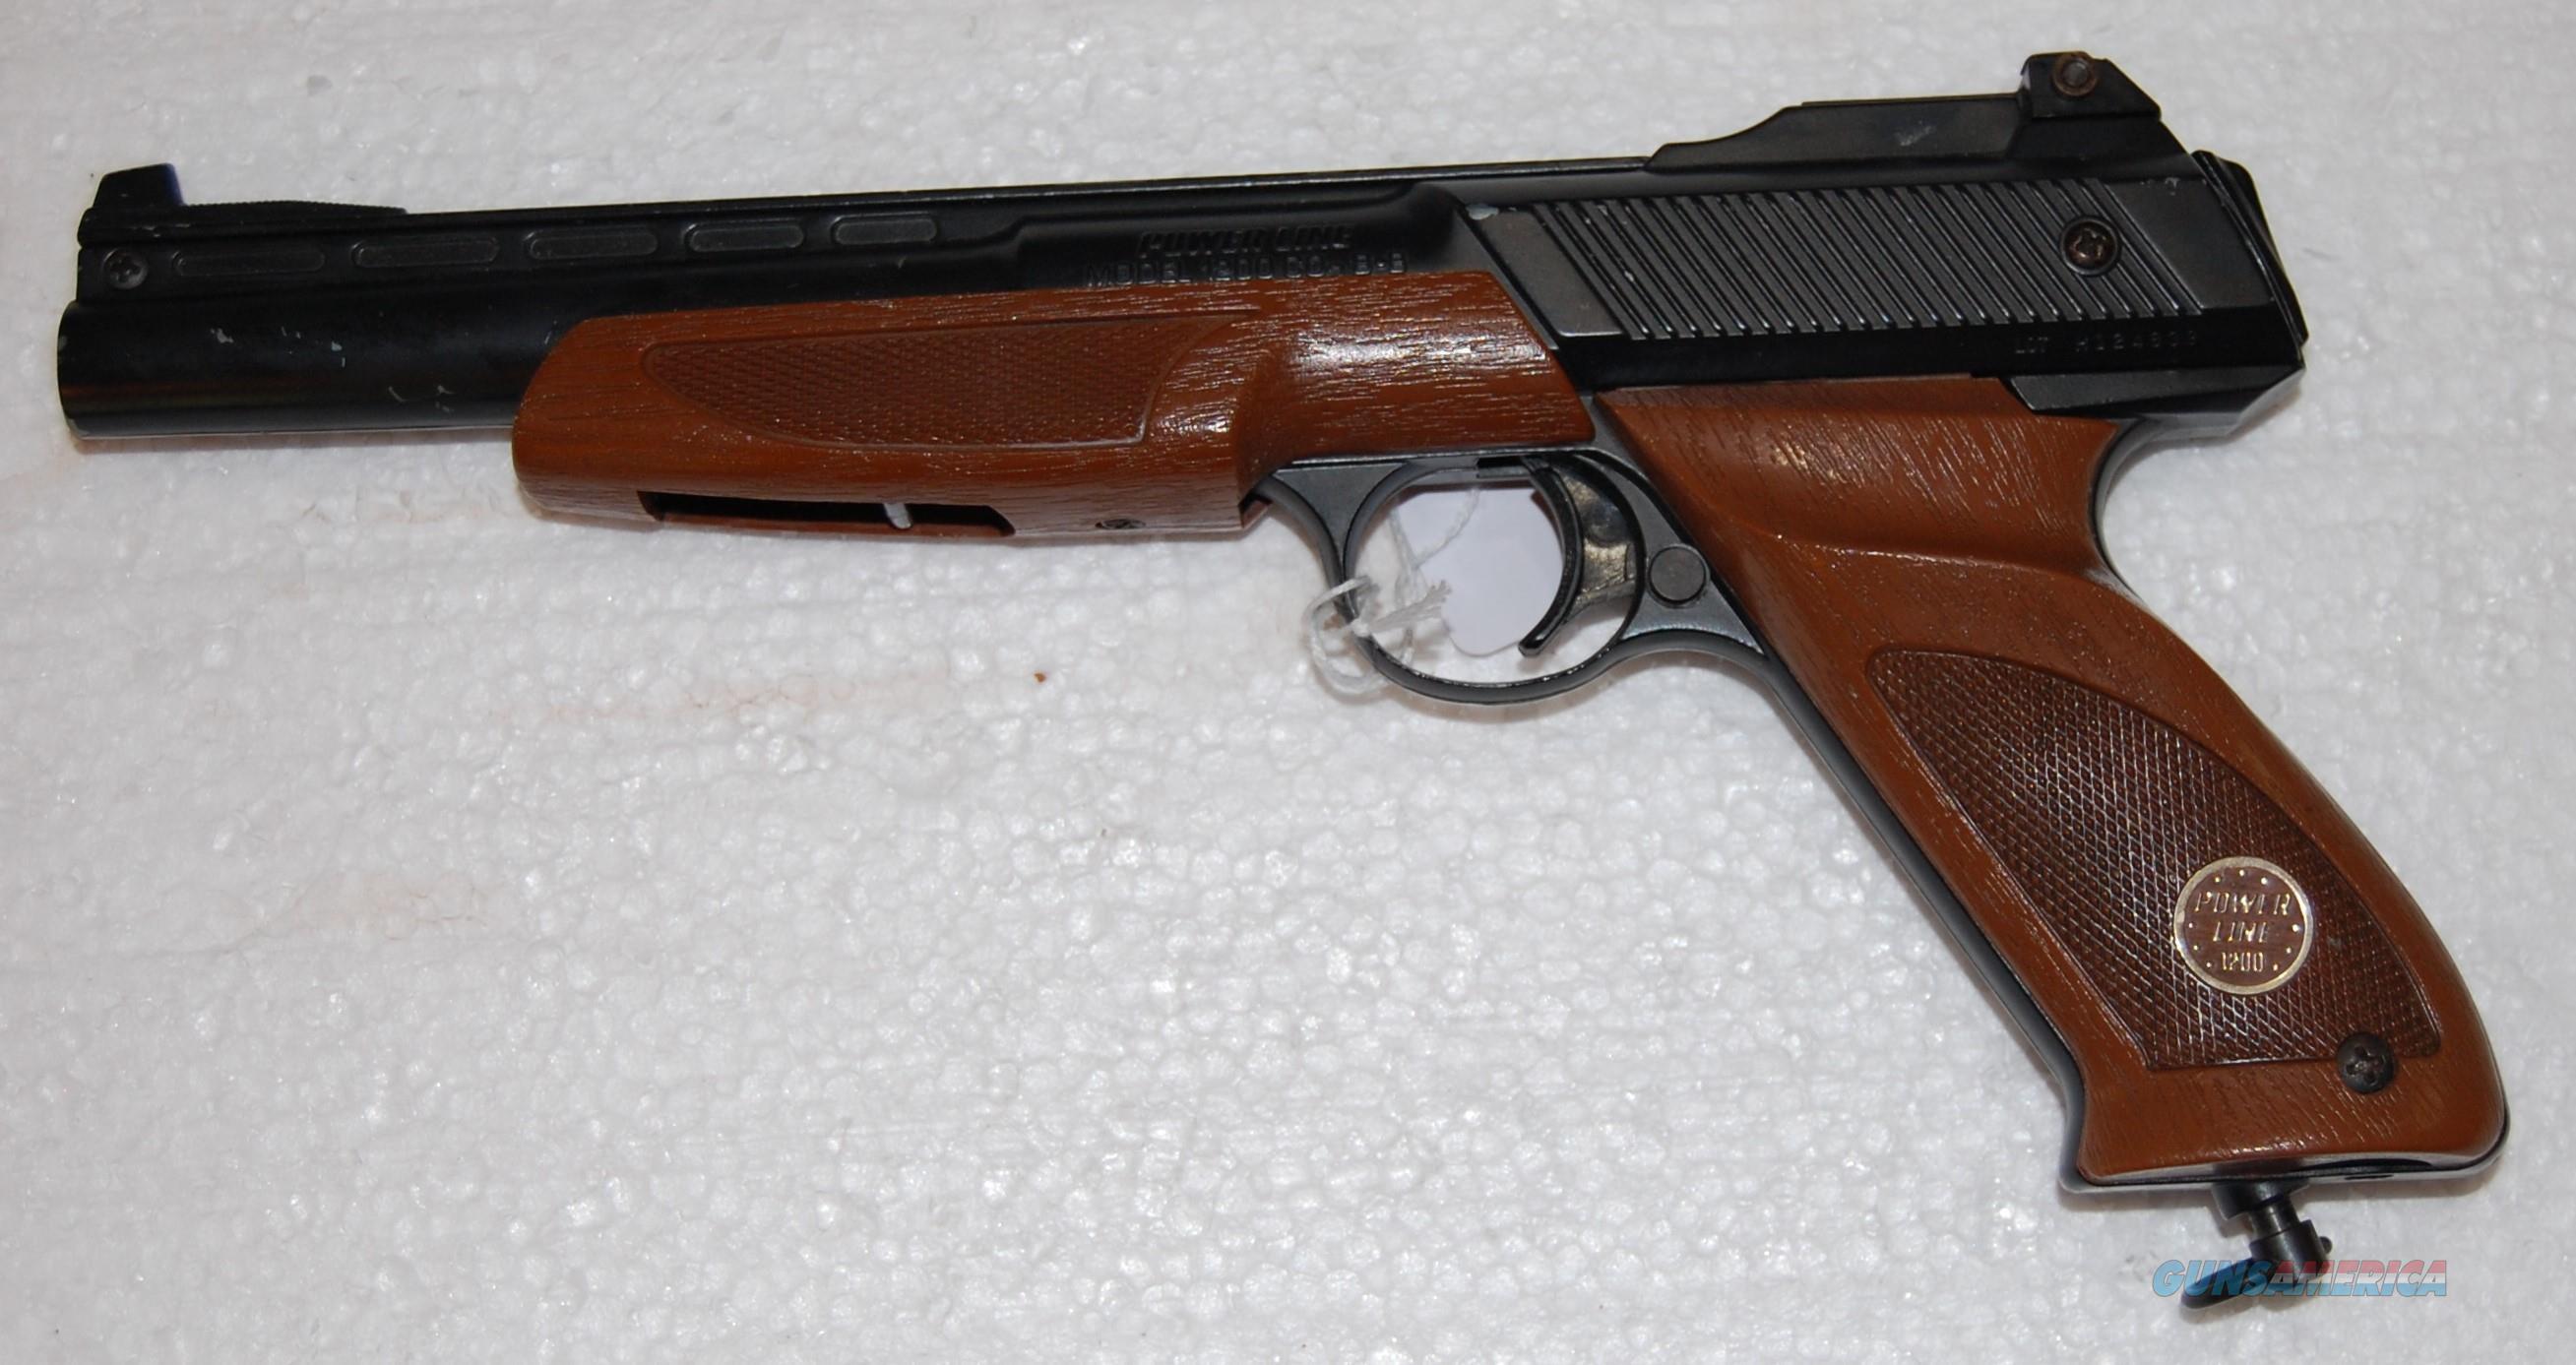 Power Line CO2 pistol  Non-Guns > Air Rifles - Pistols > CO2 Pistol